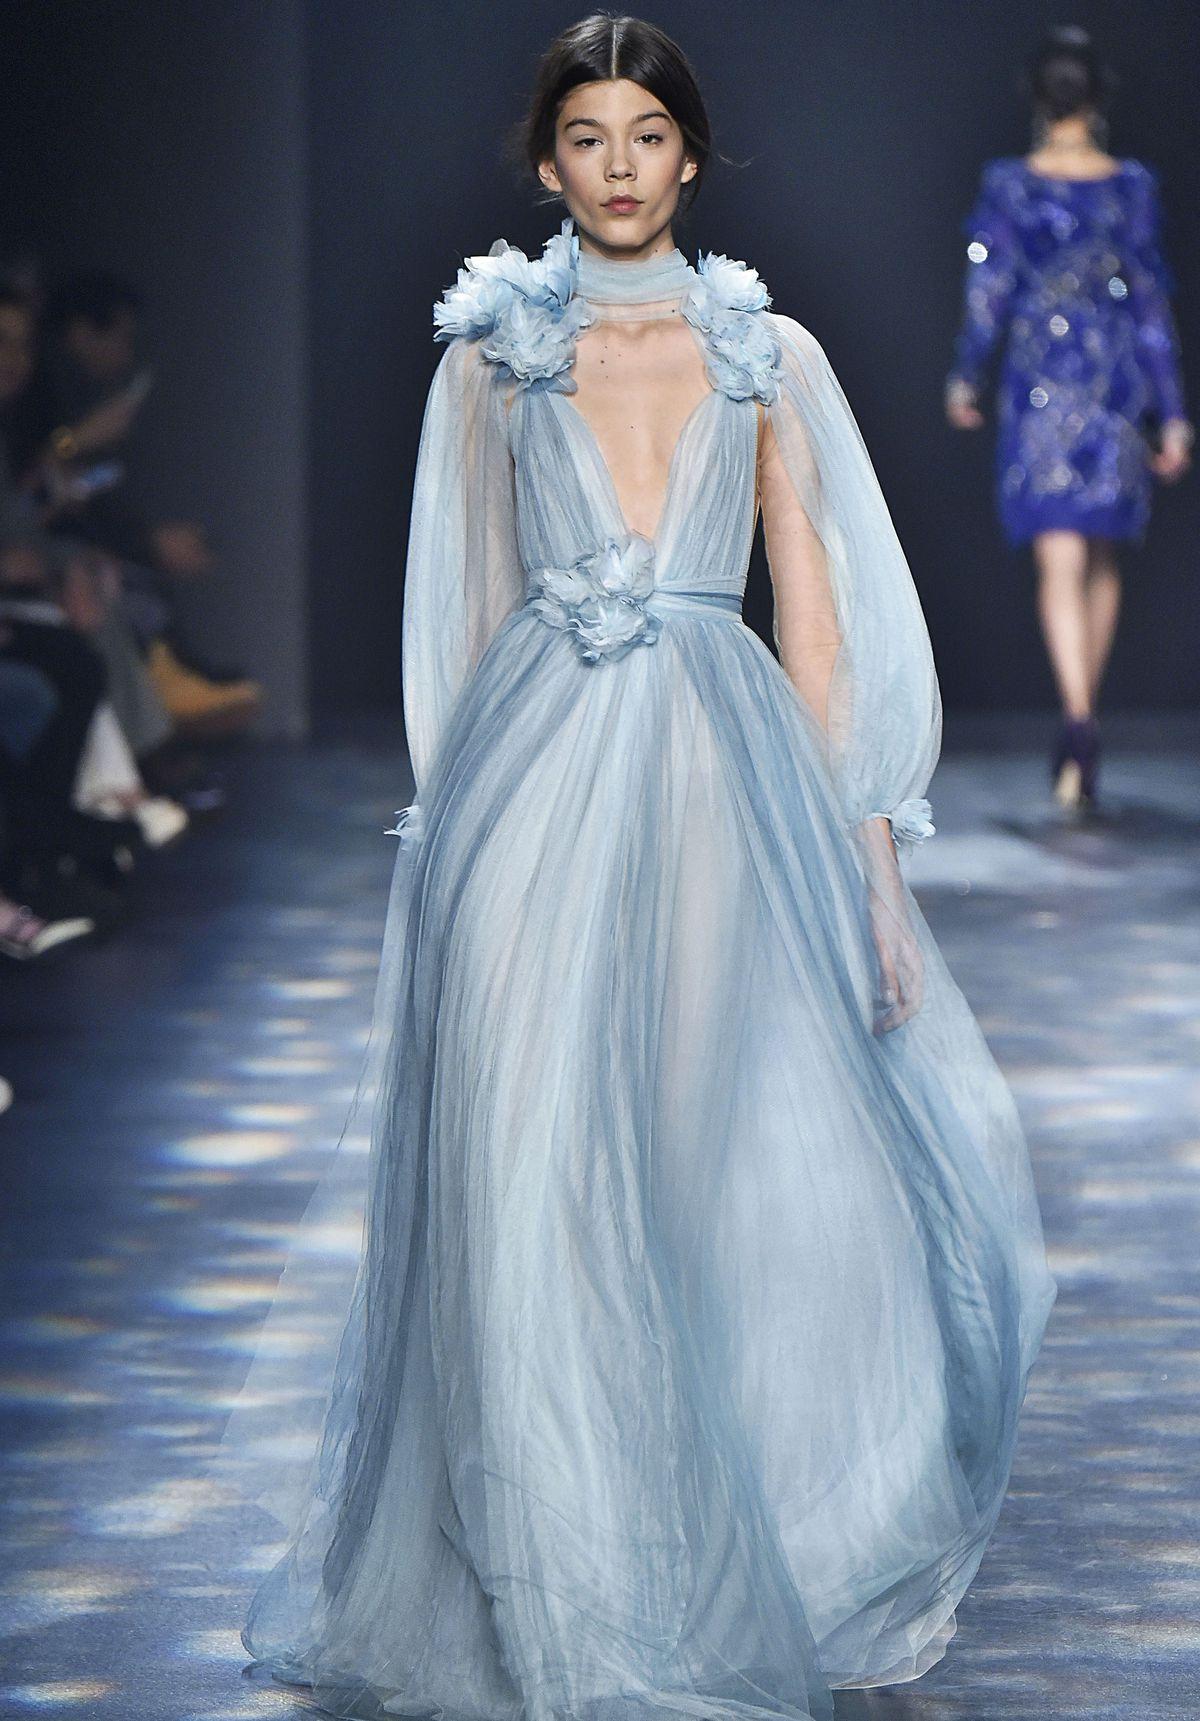 A model walks the runway wearing the blue dress.